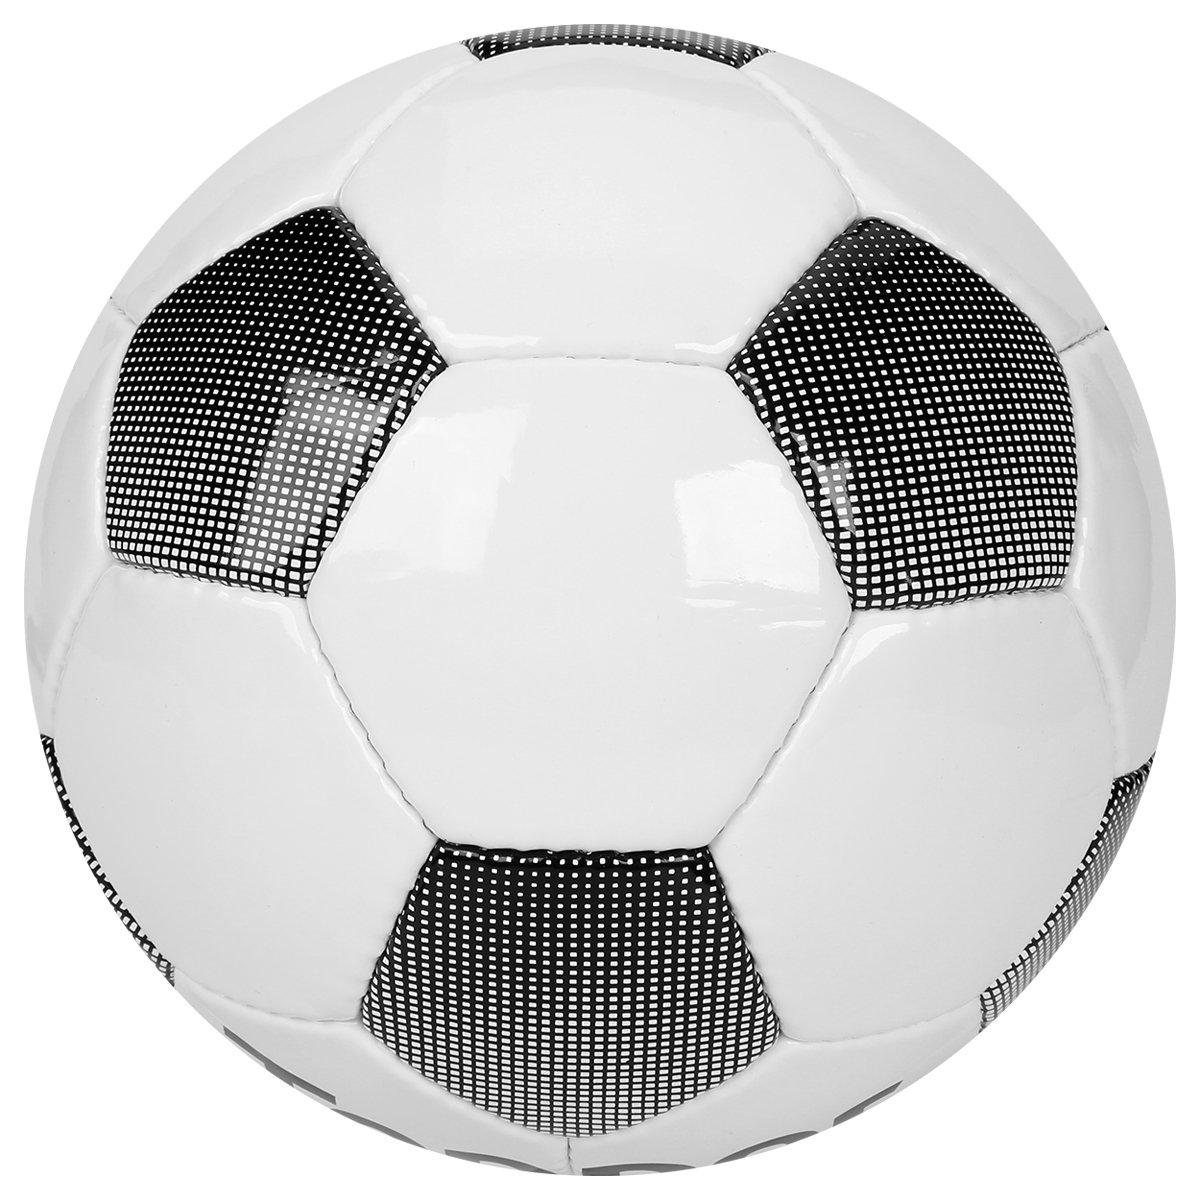 87bad0f826 Bola Futebol Society Topper Extreme 4 - Compre Agora